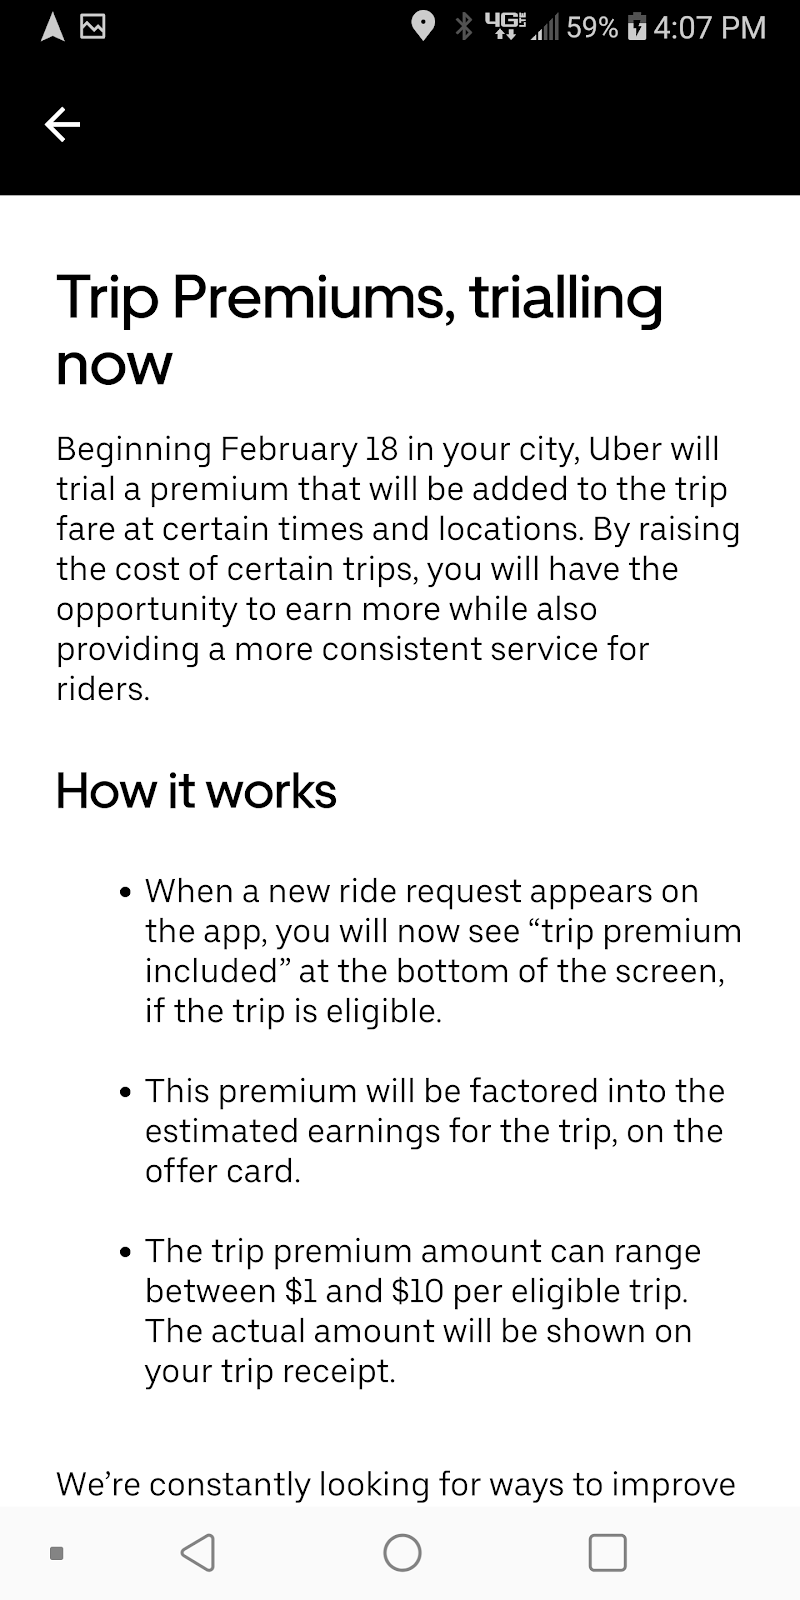 uber trip premiums